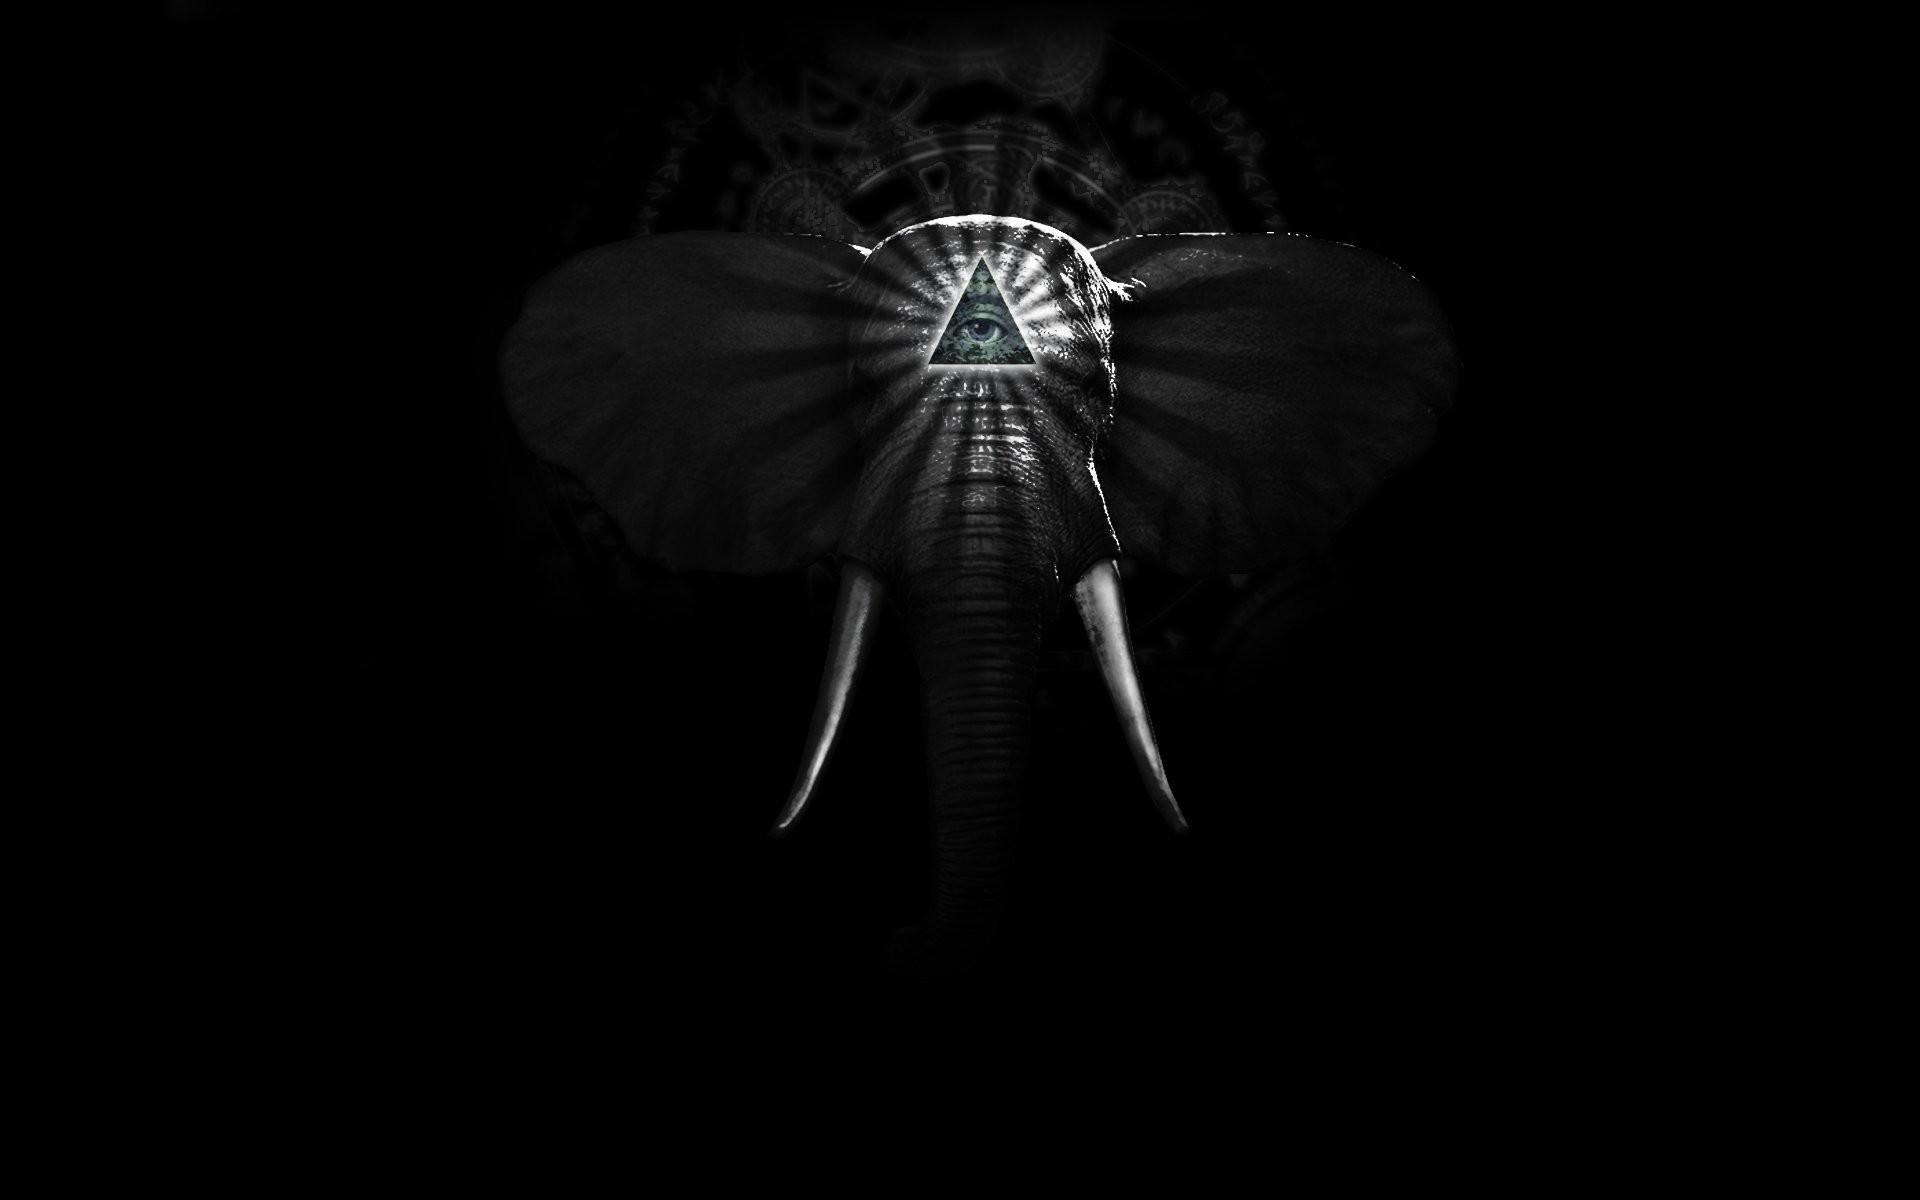 Res: 1920x1200, Background web elephant hd.